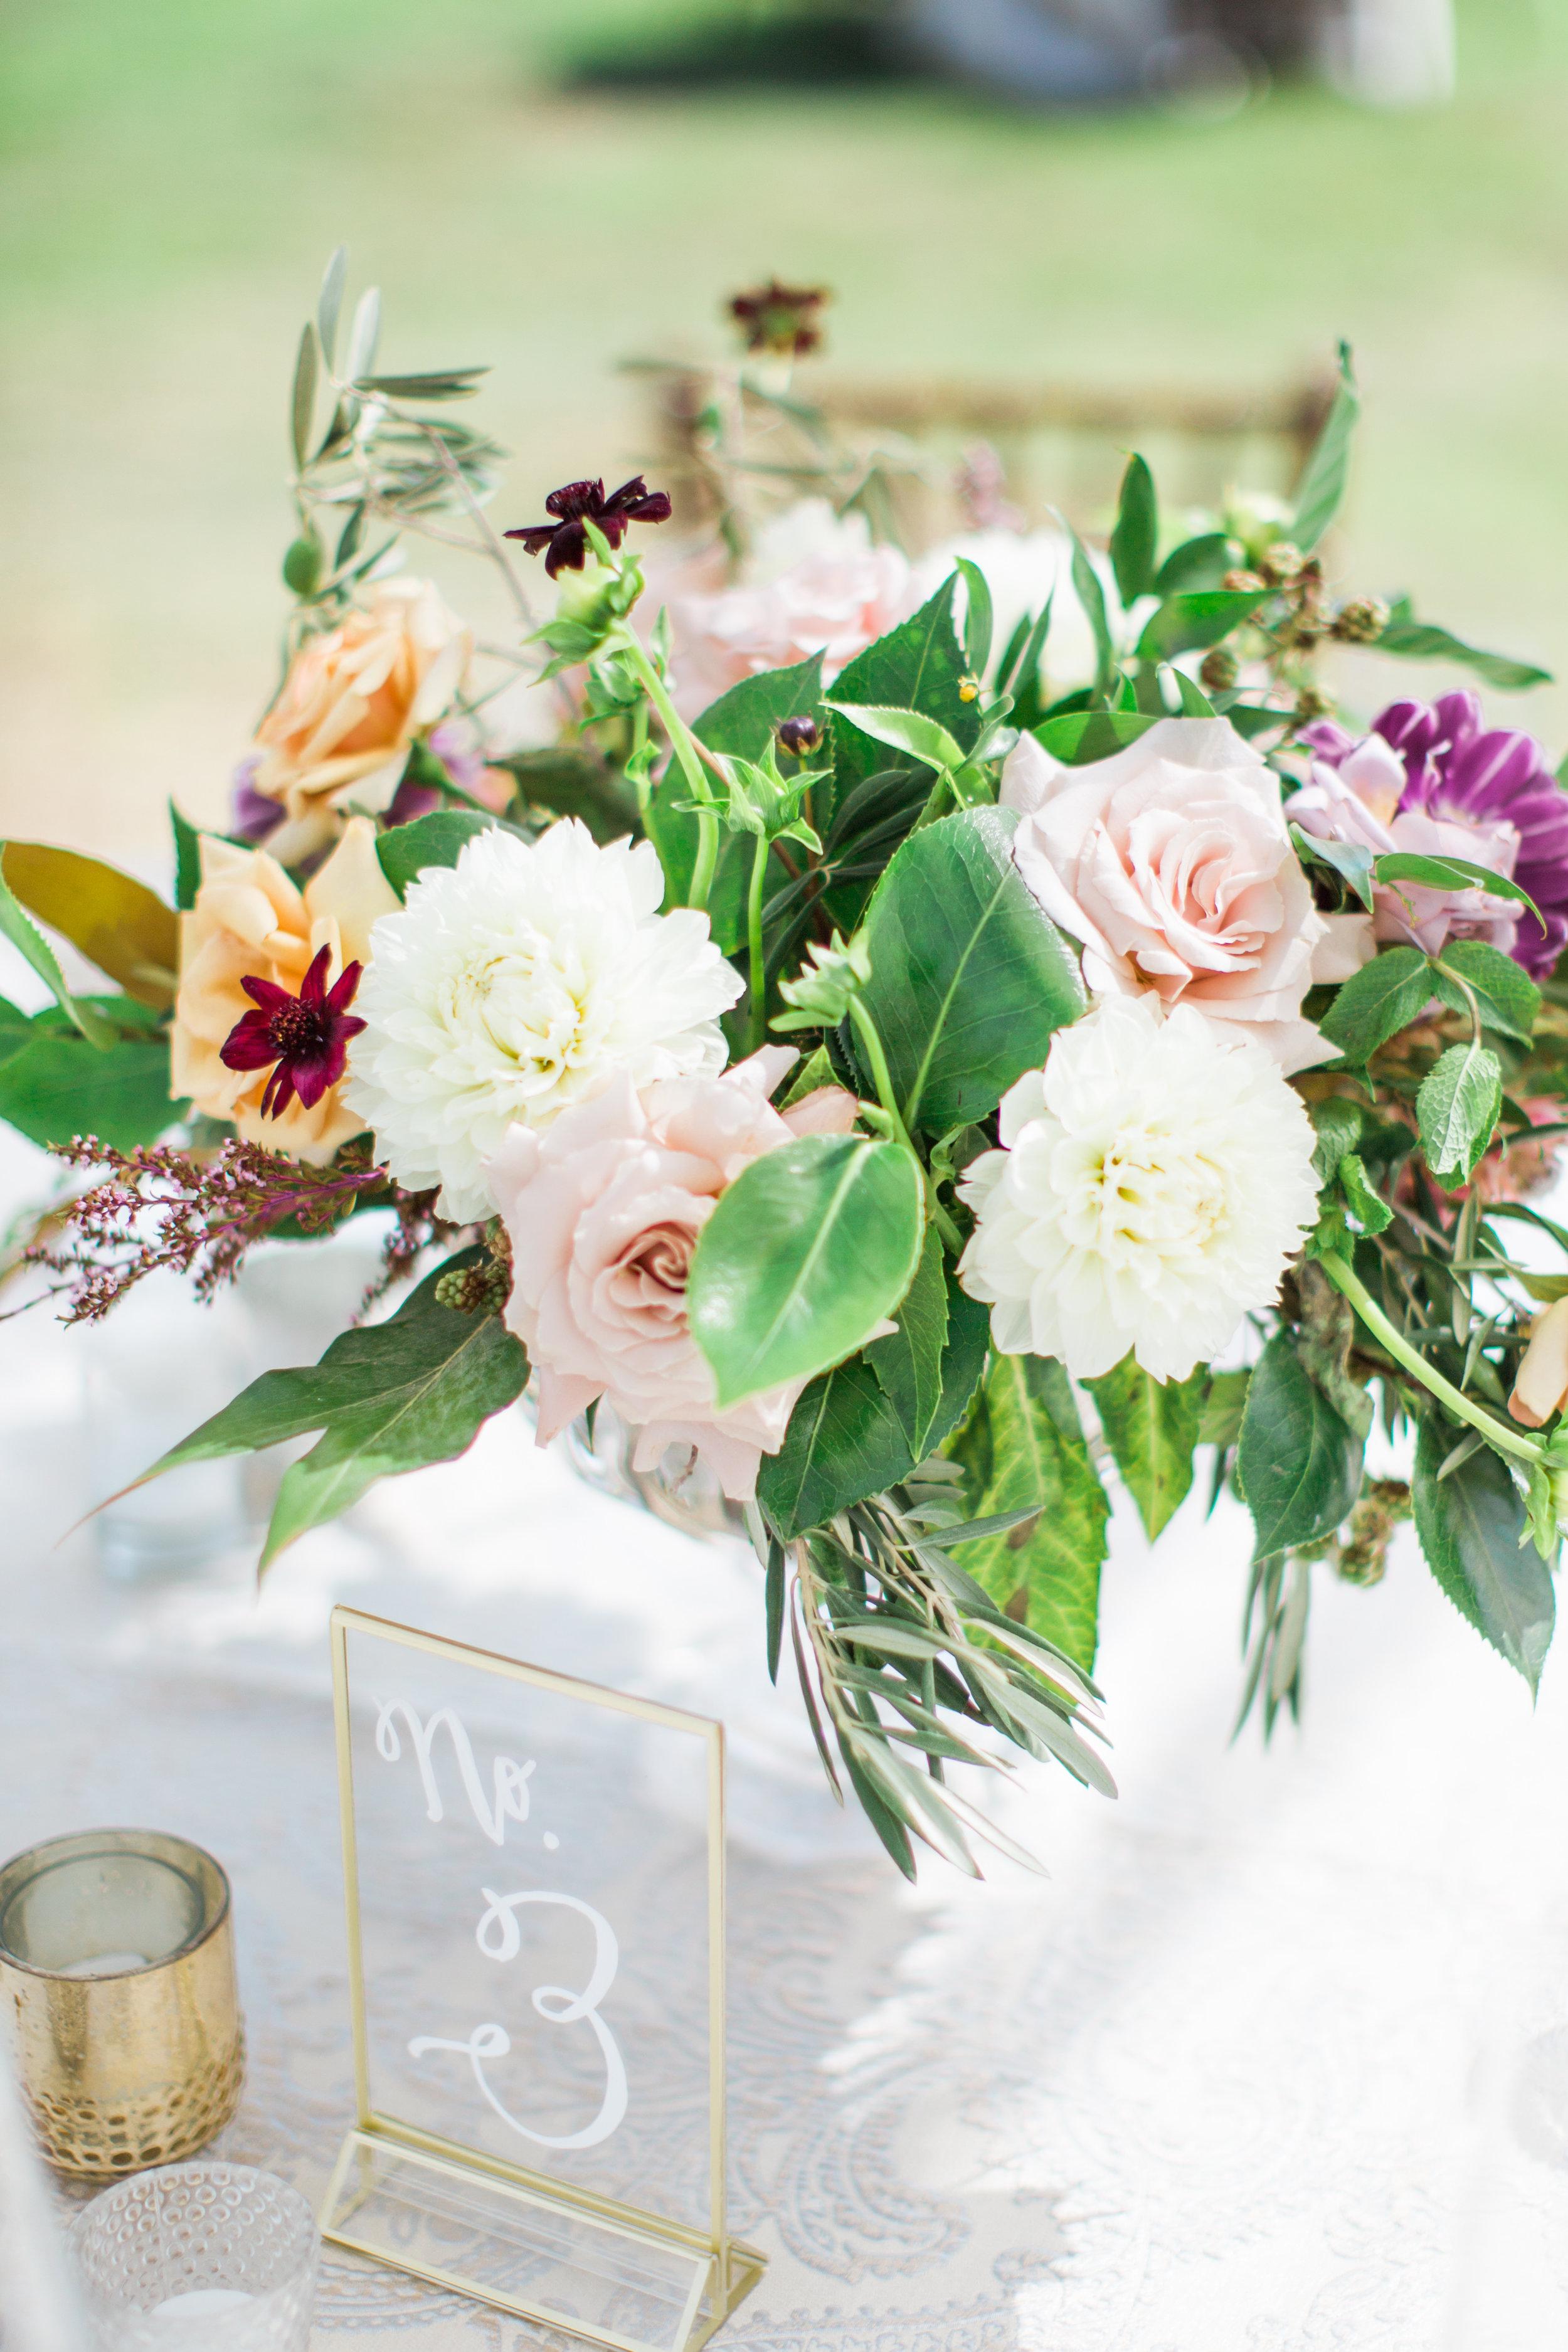 Blooms-breesa-lee-luxury-florist-aga-jones-tres-chic-affairs-san-diego-wedding-classic-coast-catering-(43).jpg